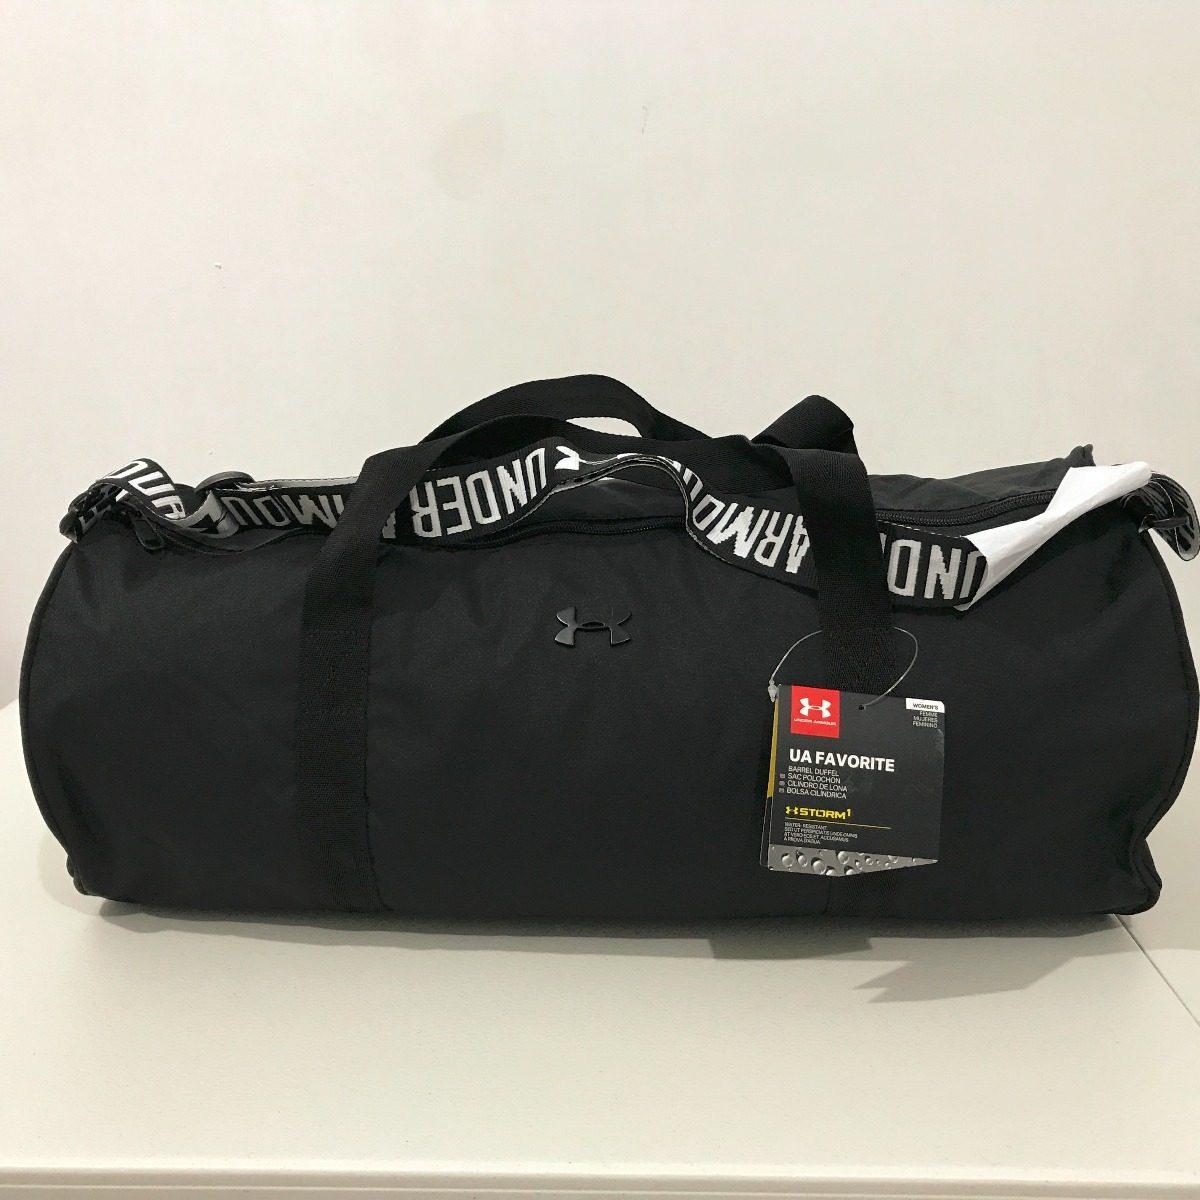 maleta deportiva under armour cilindro storm 1 gym fitness. Cargando zoom. 82d90abb0c9fe